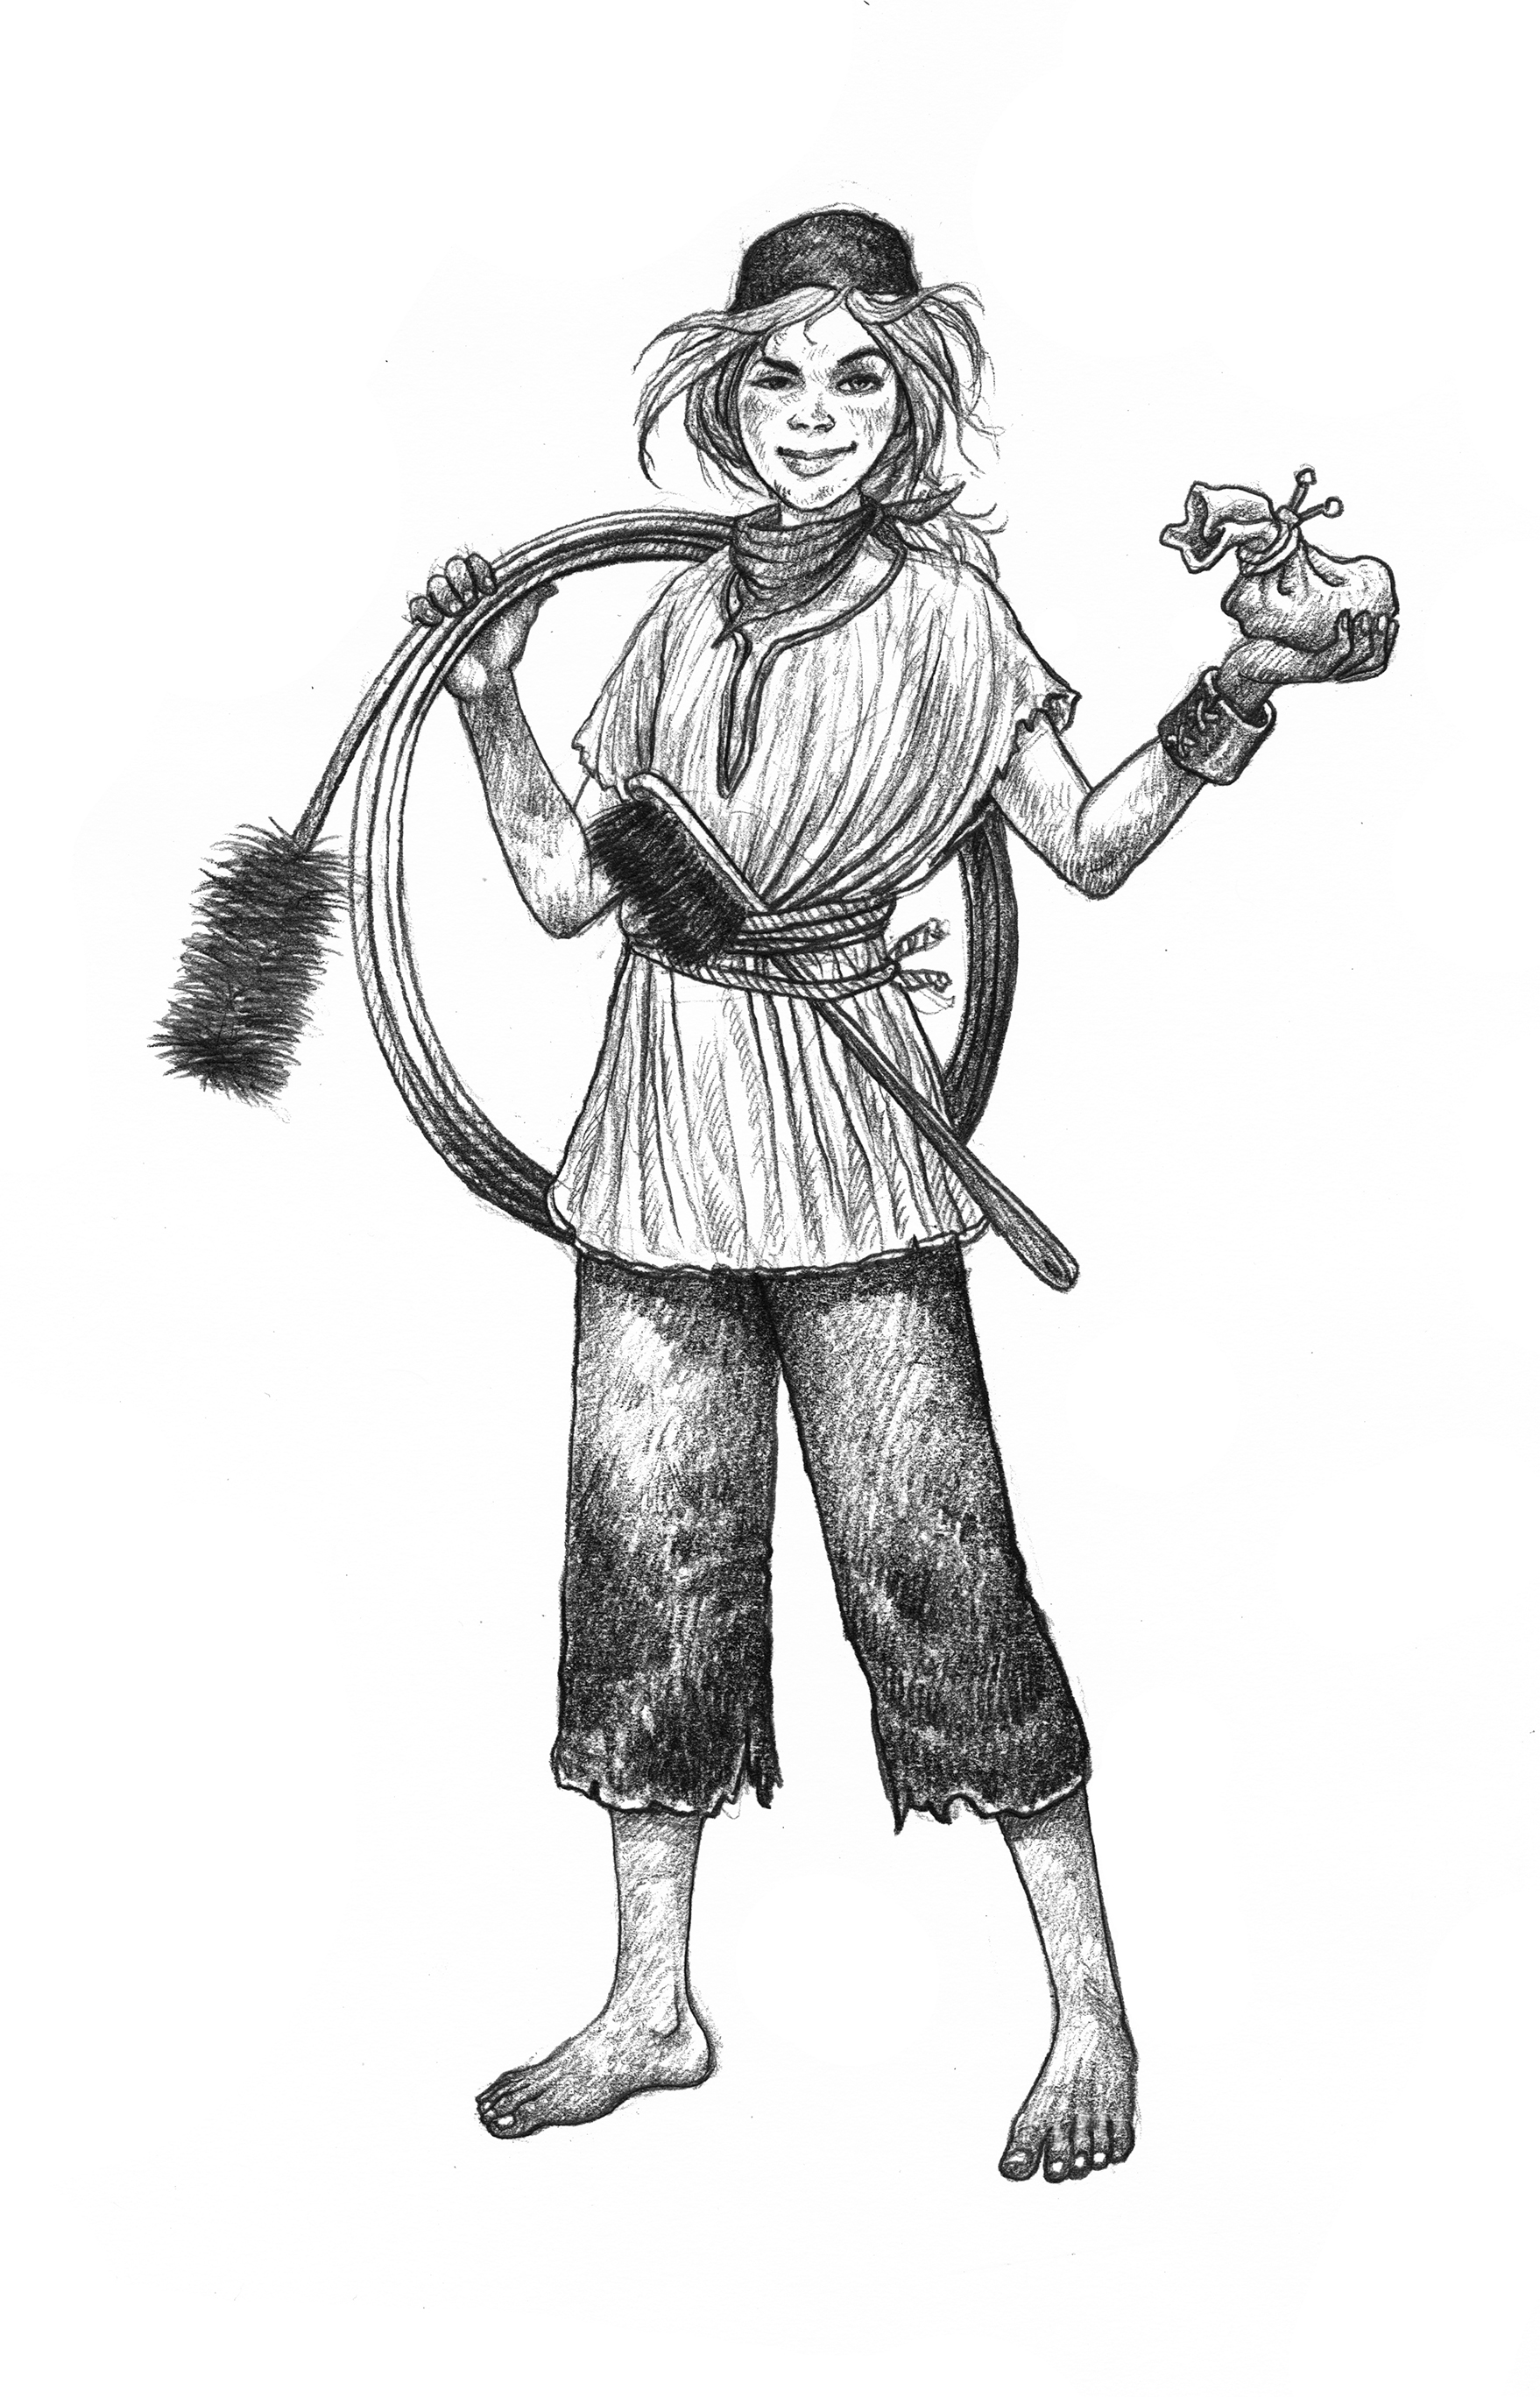 ZWEIHÄNDER Grim & Perilous RPG: Guttersnipe (Image: Grim & Perilous Studios)